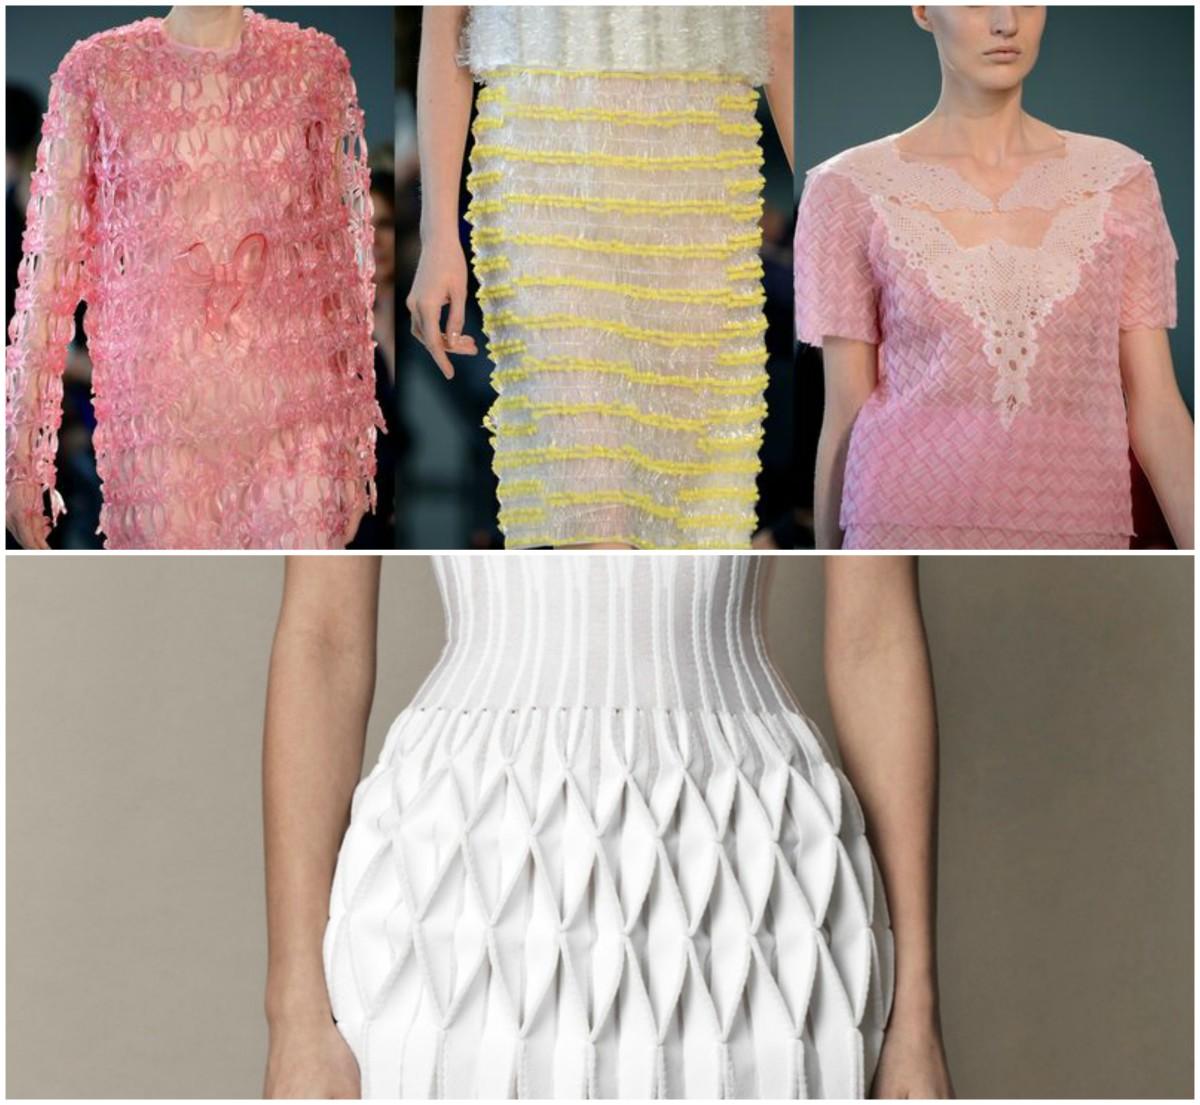 decoding-principles-of-design-in-fashion